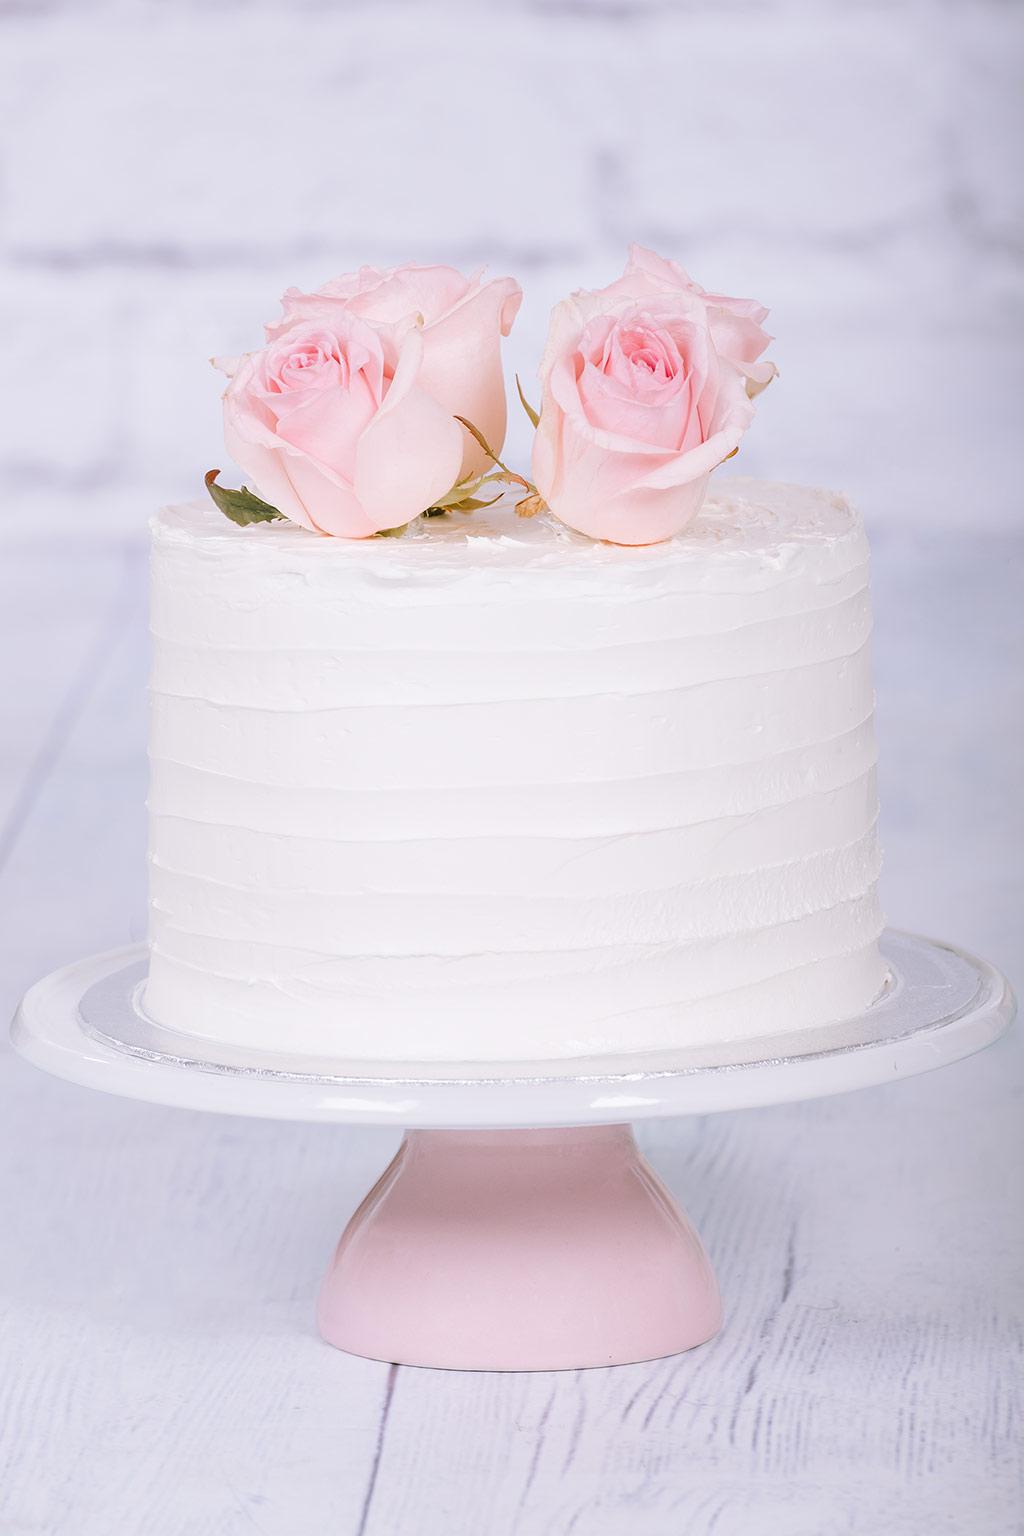 venta de tartas en Barcelona, comprar tartas, tartas personalizadas, tartas decoradas, tartas artesanales,